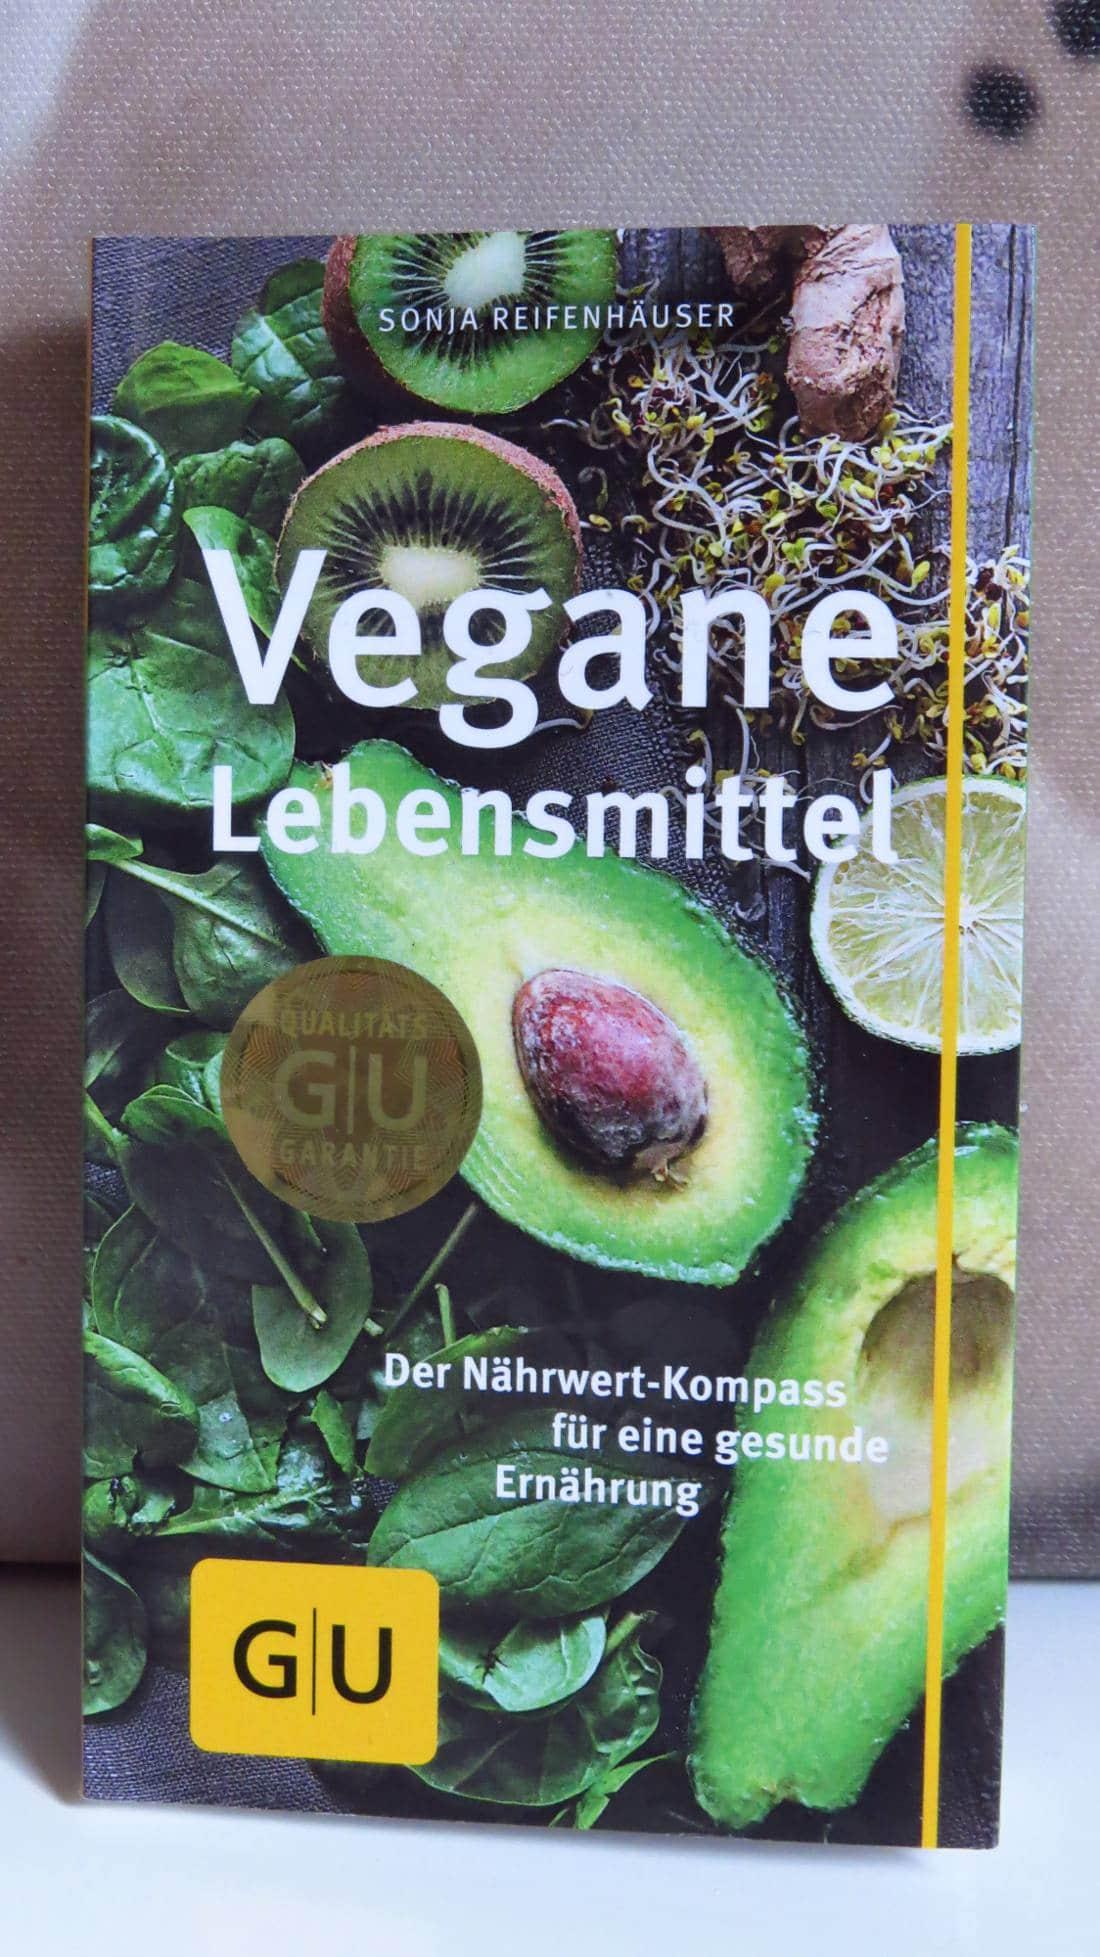 Sonja Reifenhäuser - Vegane Lebensmittel